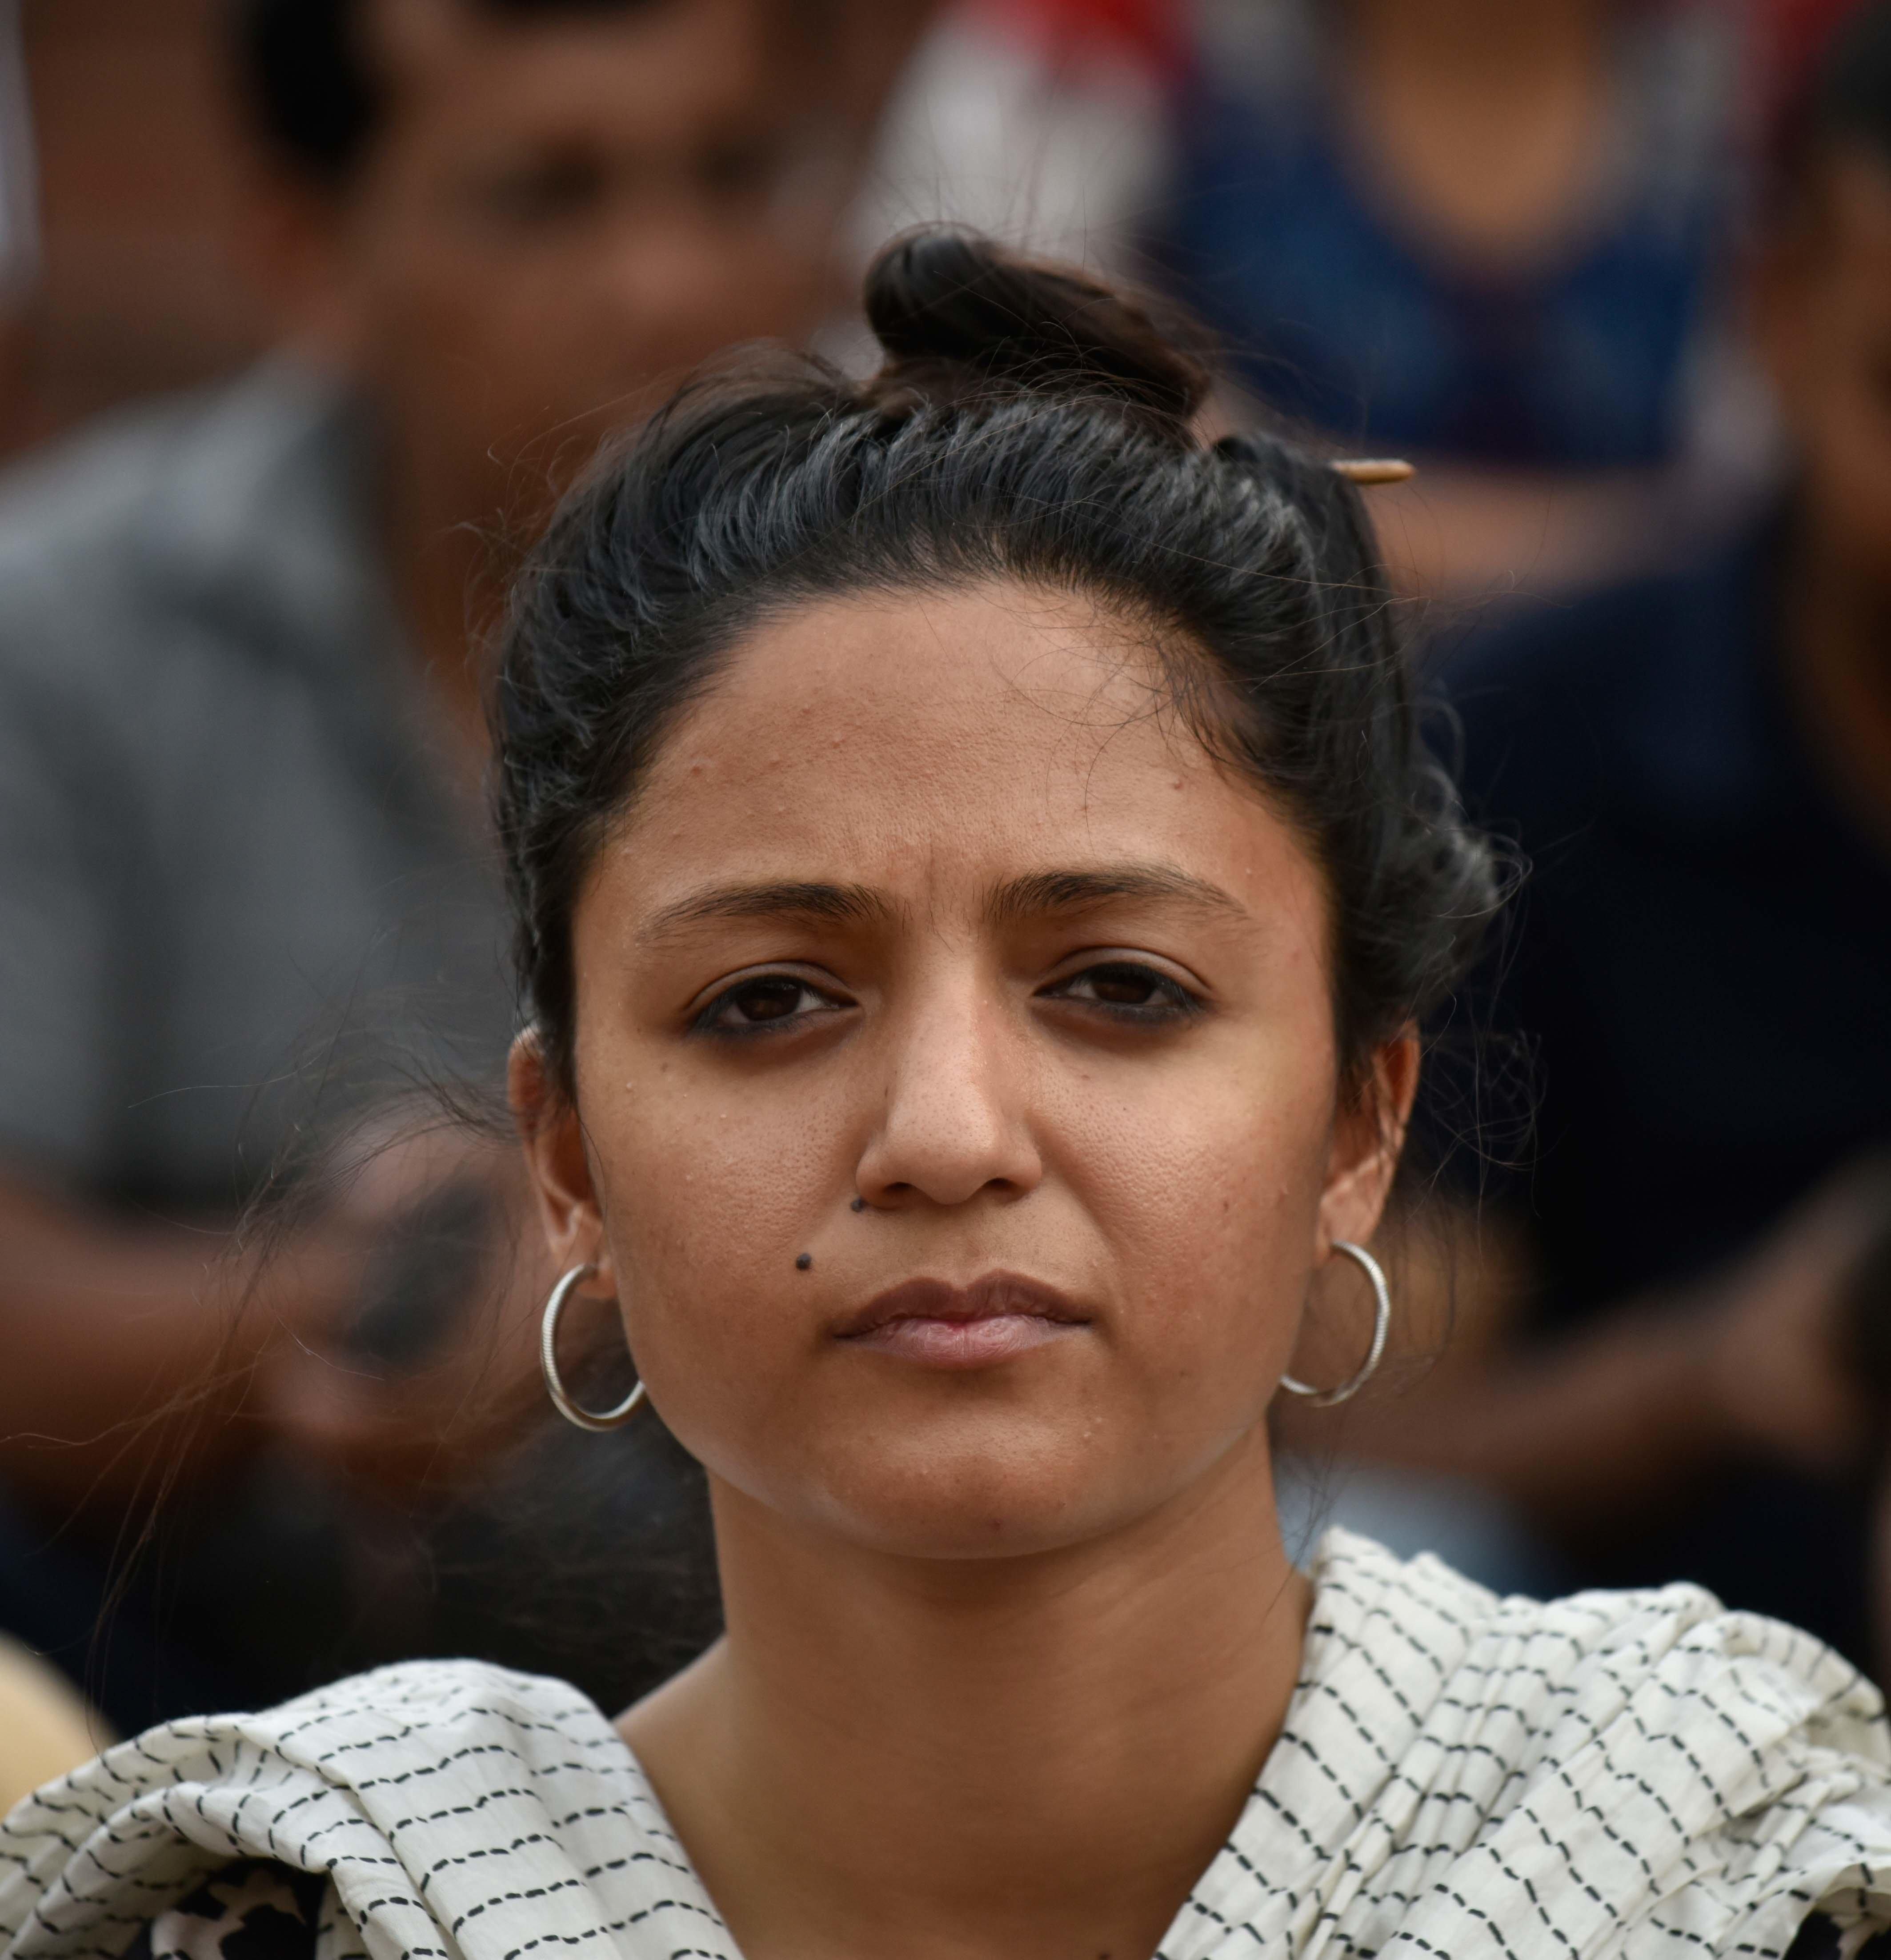 JNU Scholar Shehla Rashid Booked By Uttarakhand Police For 'Spreading Rumours' On